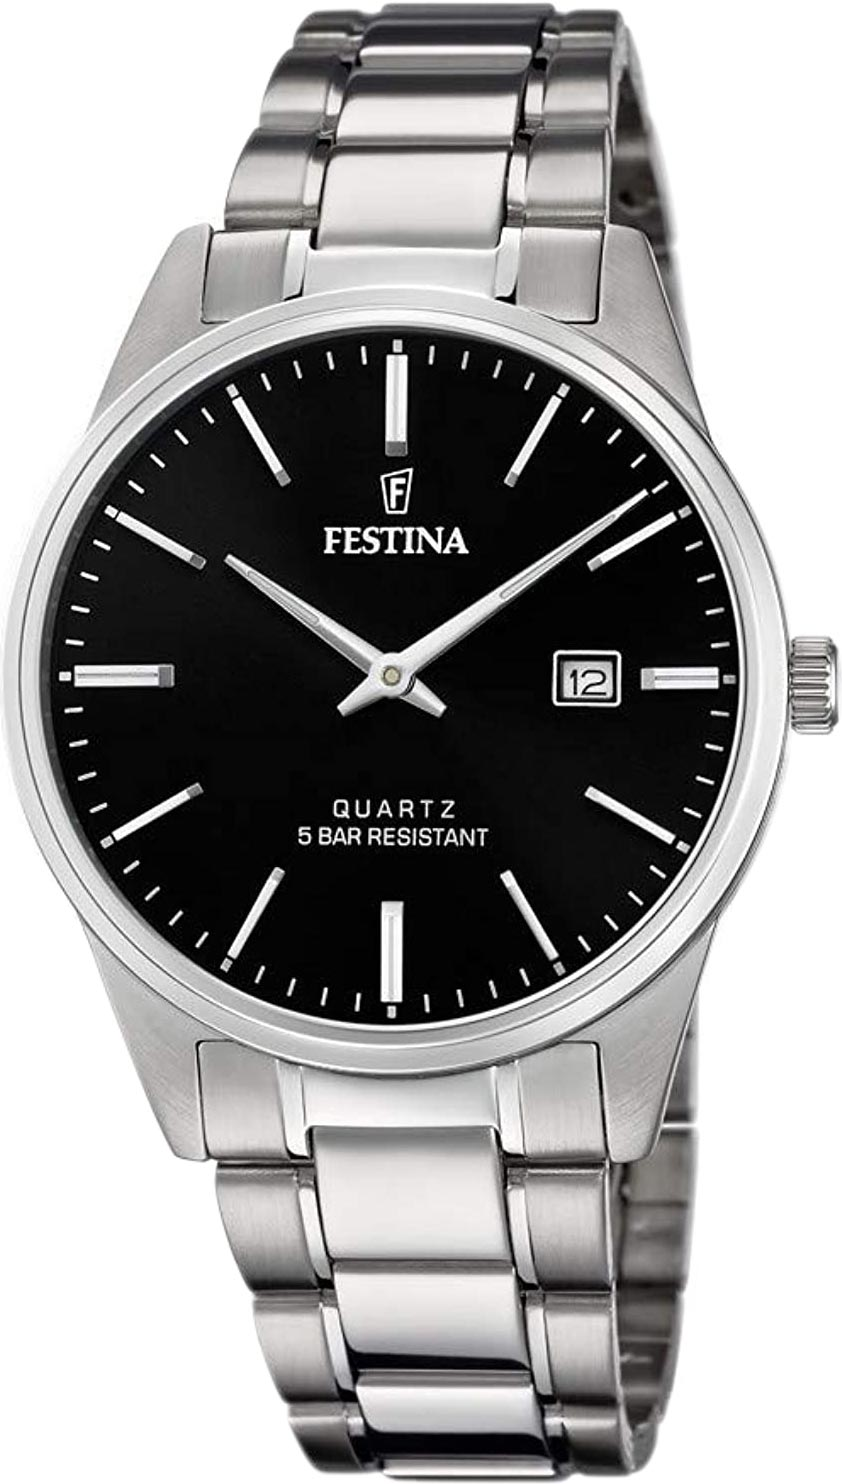 Фото - Мужские часы Festina F20511/4 мужские часы festina f20536 4